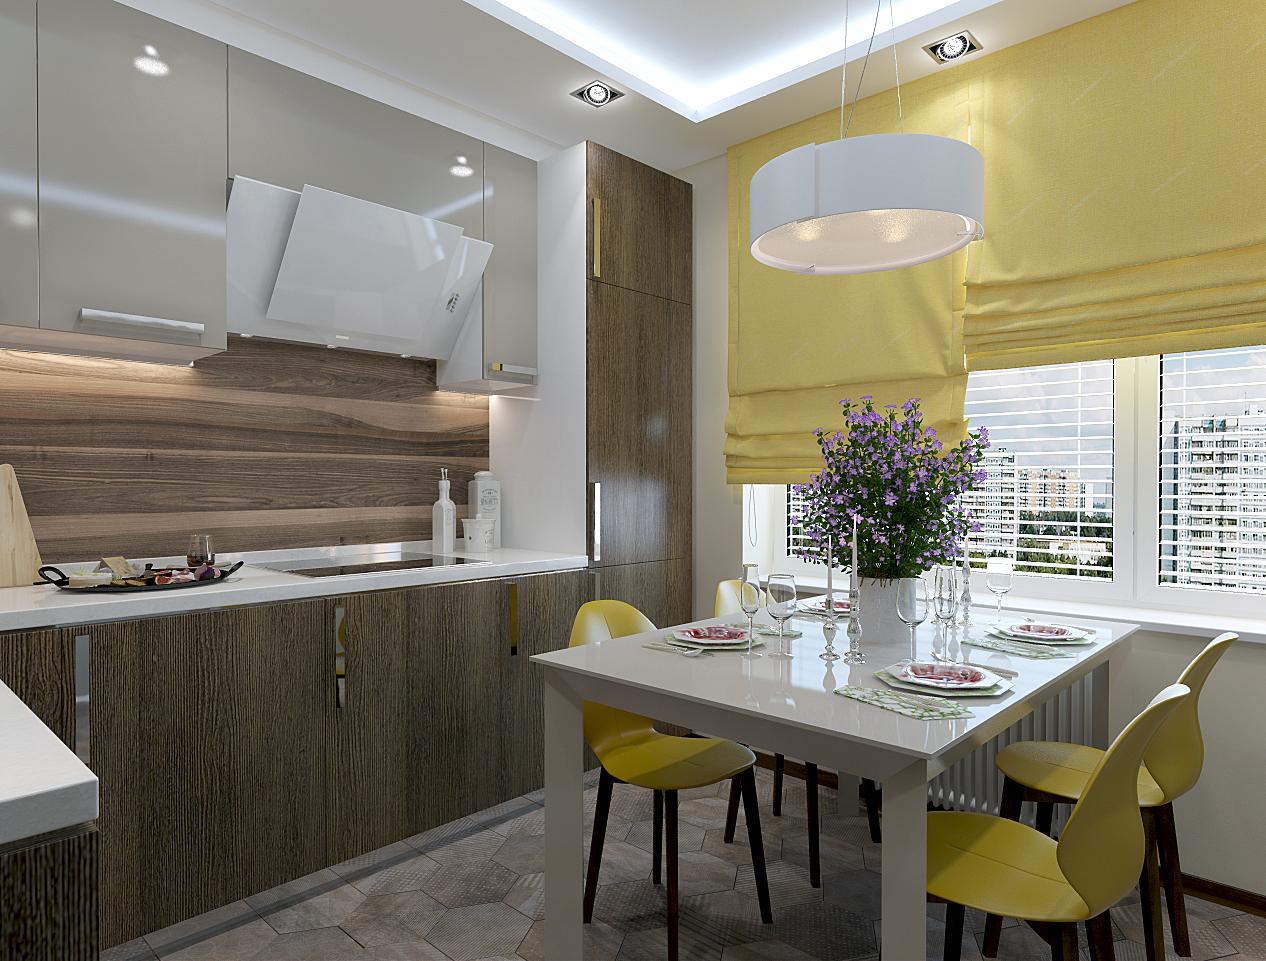 Дизайн проект кухни 20 кв.м.